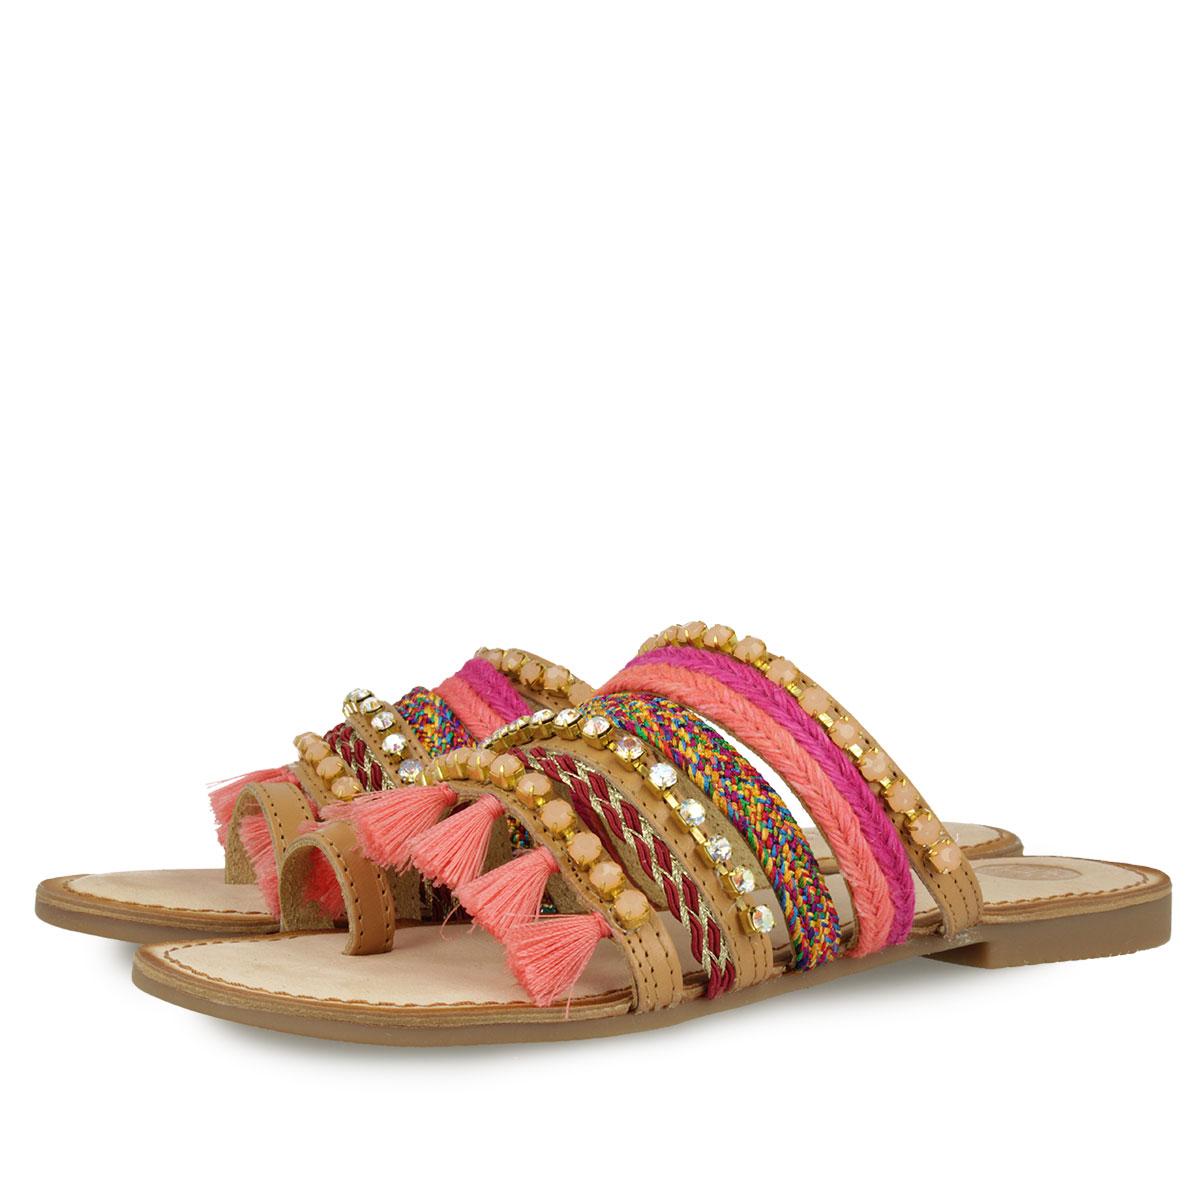 Zapatos rosas étnicos para mujer l59wCctW